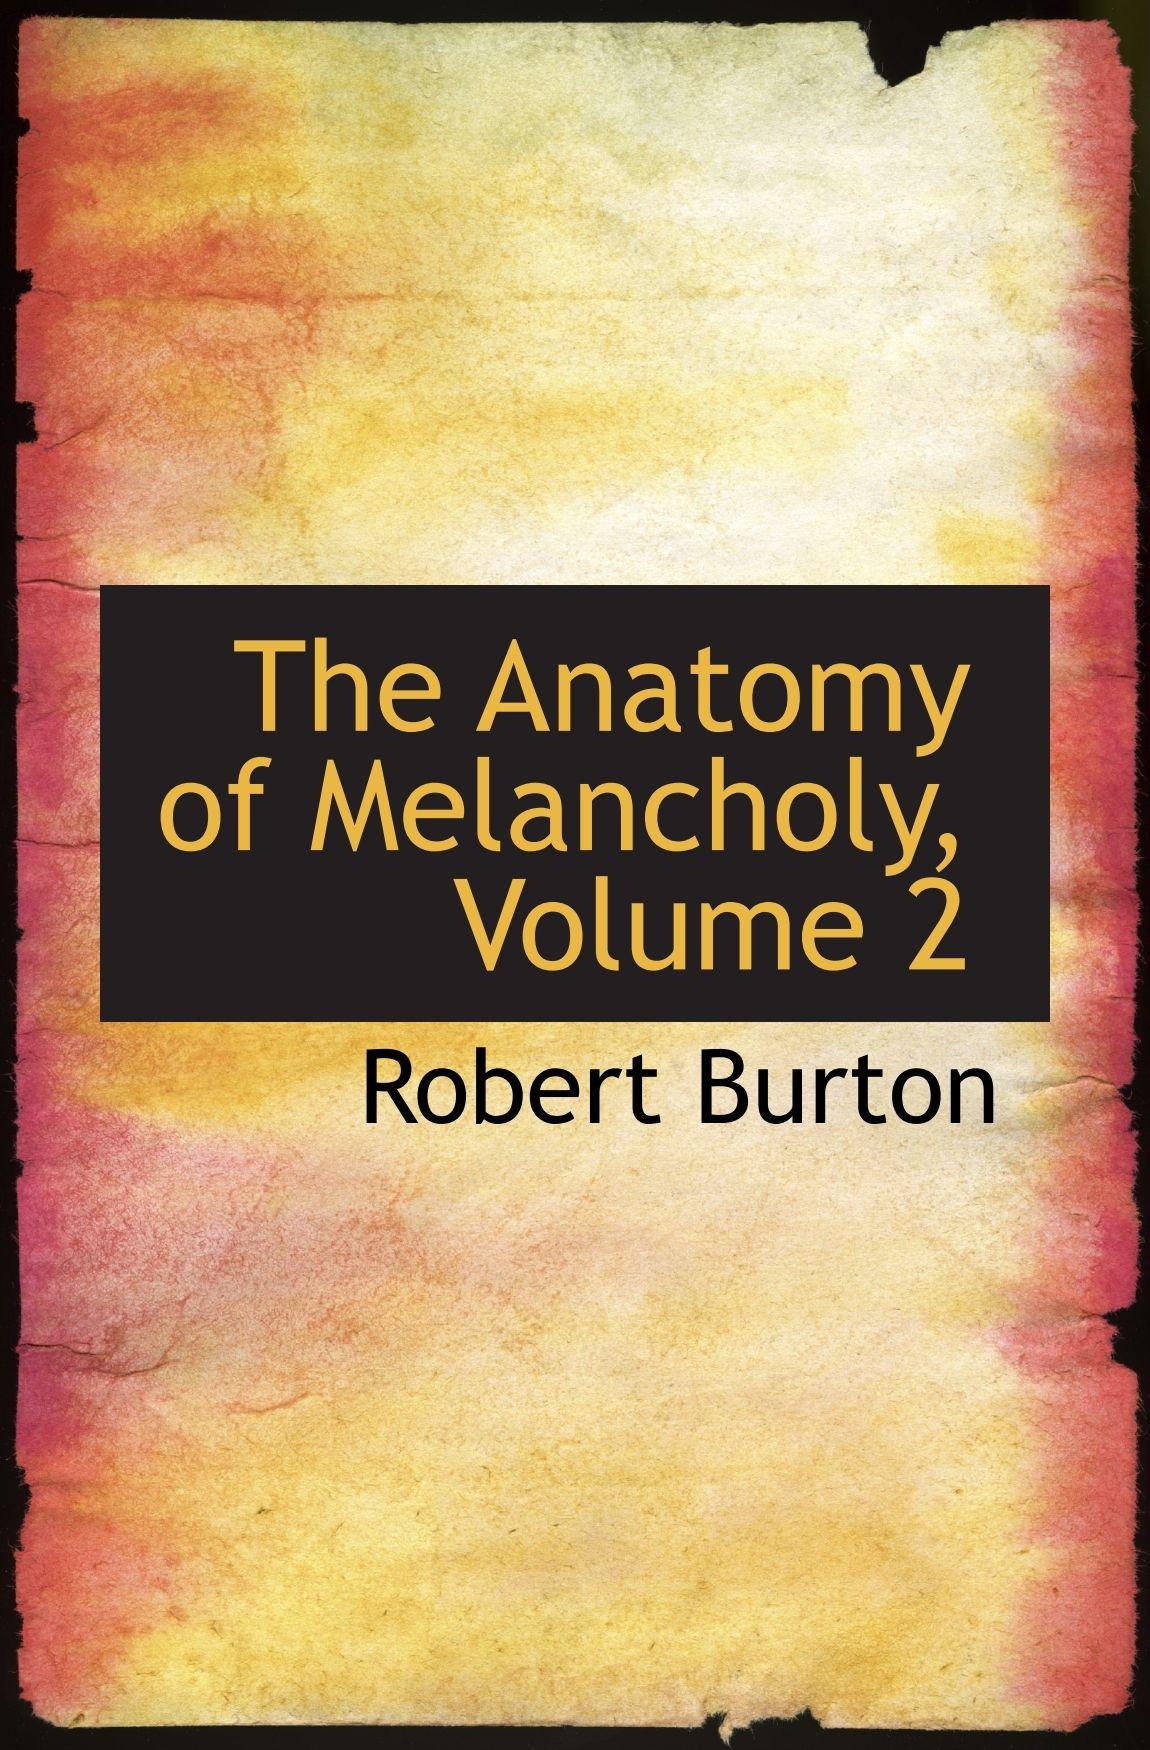 The Anatomy of Melancholy, Volume 2: Robert Burton: 9780559136061 ...